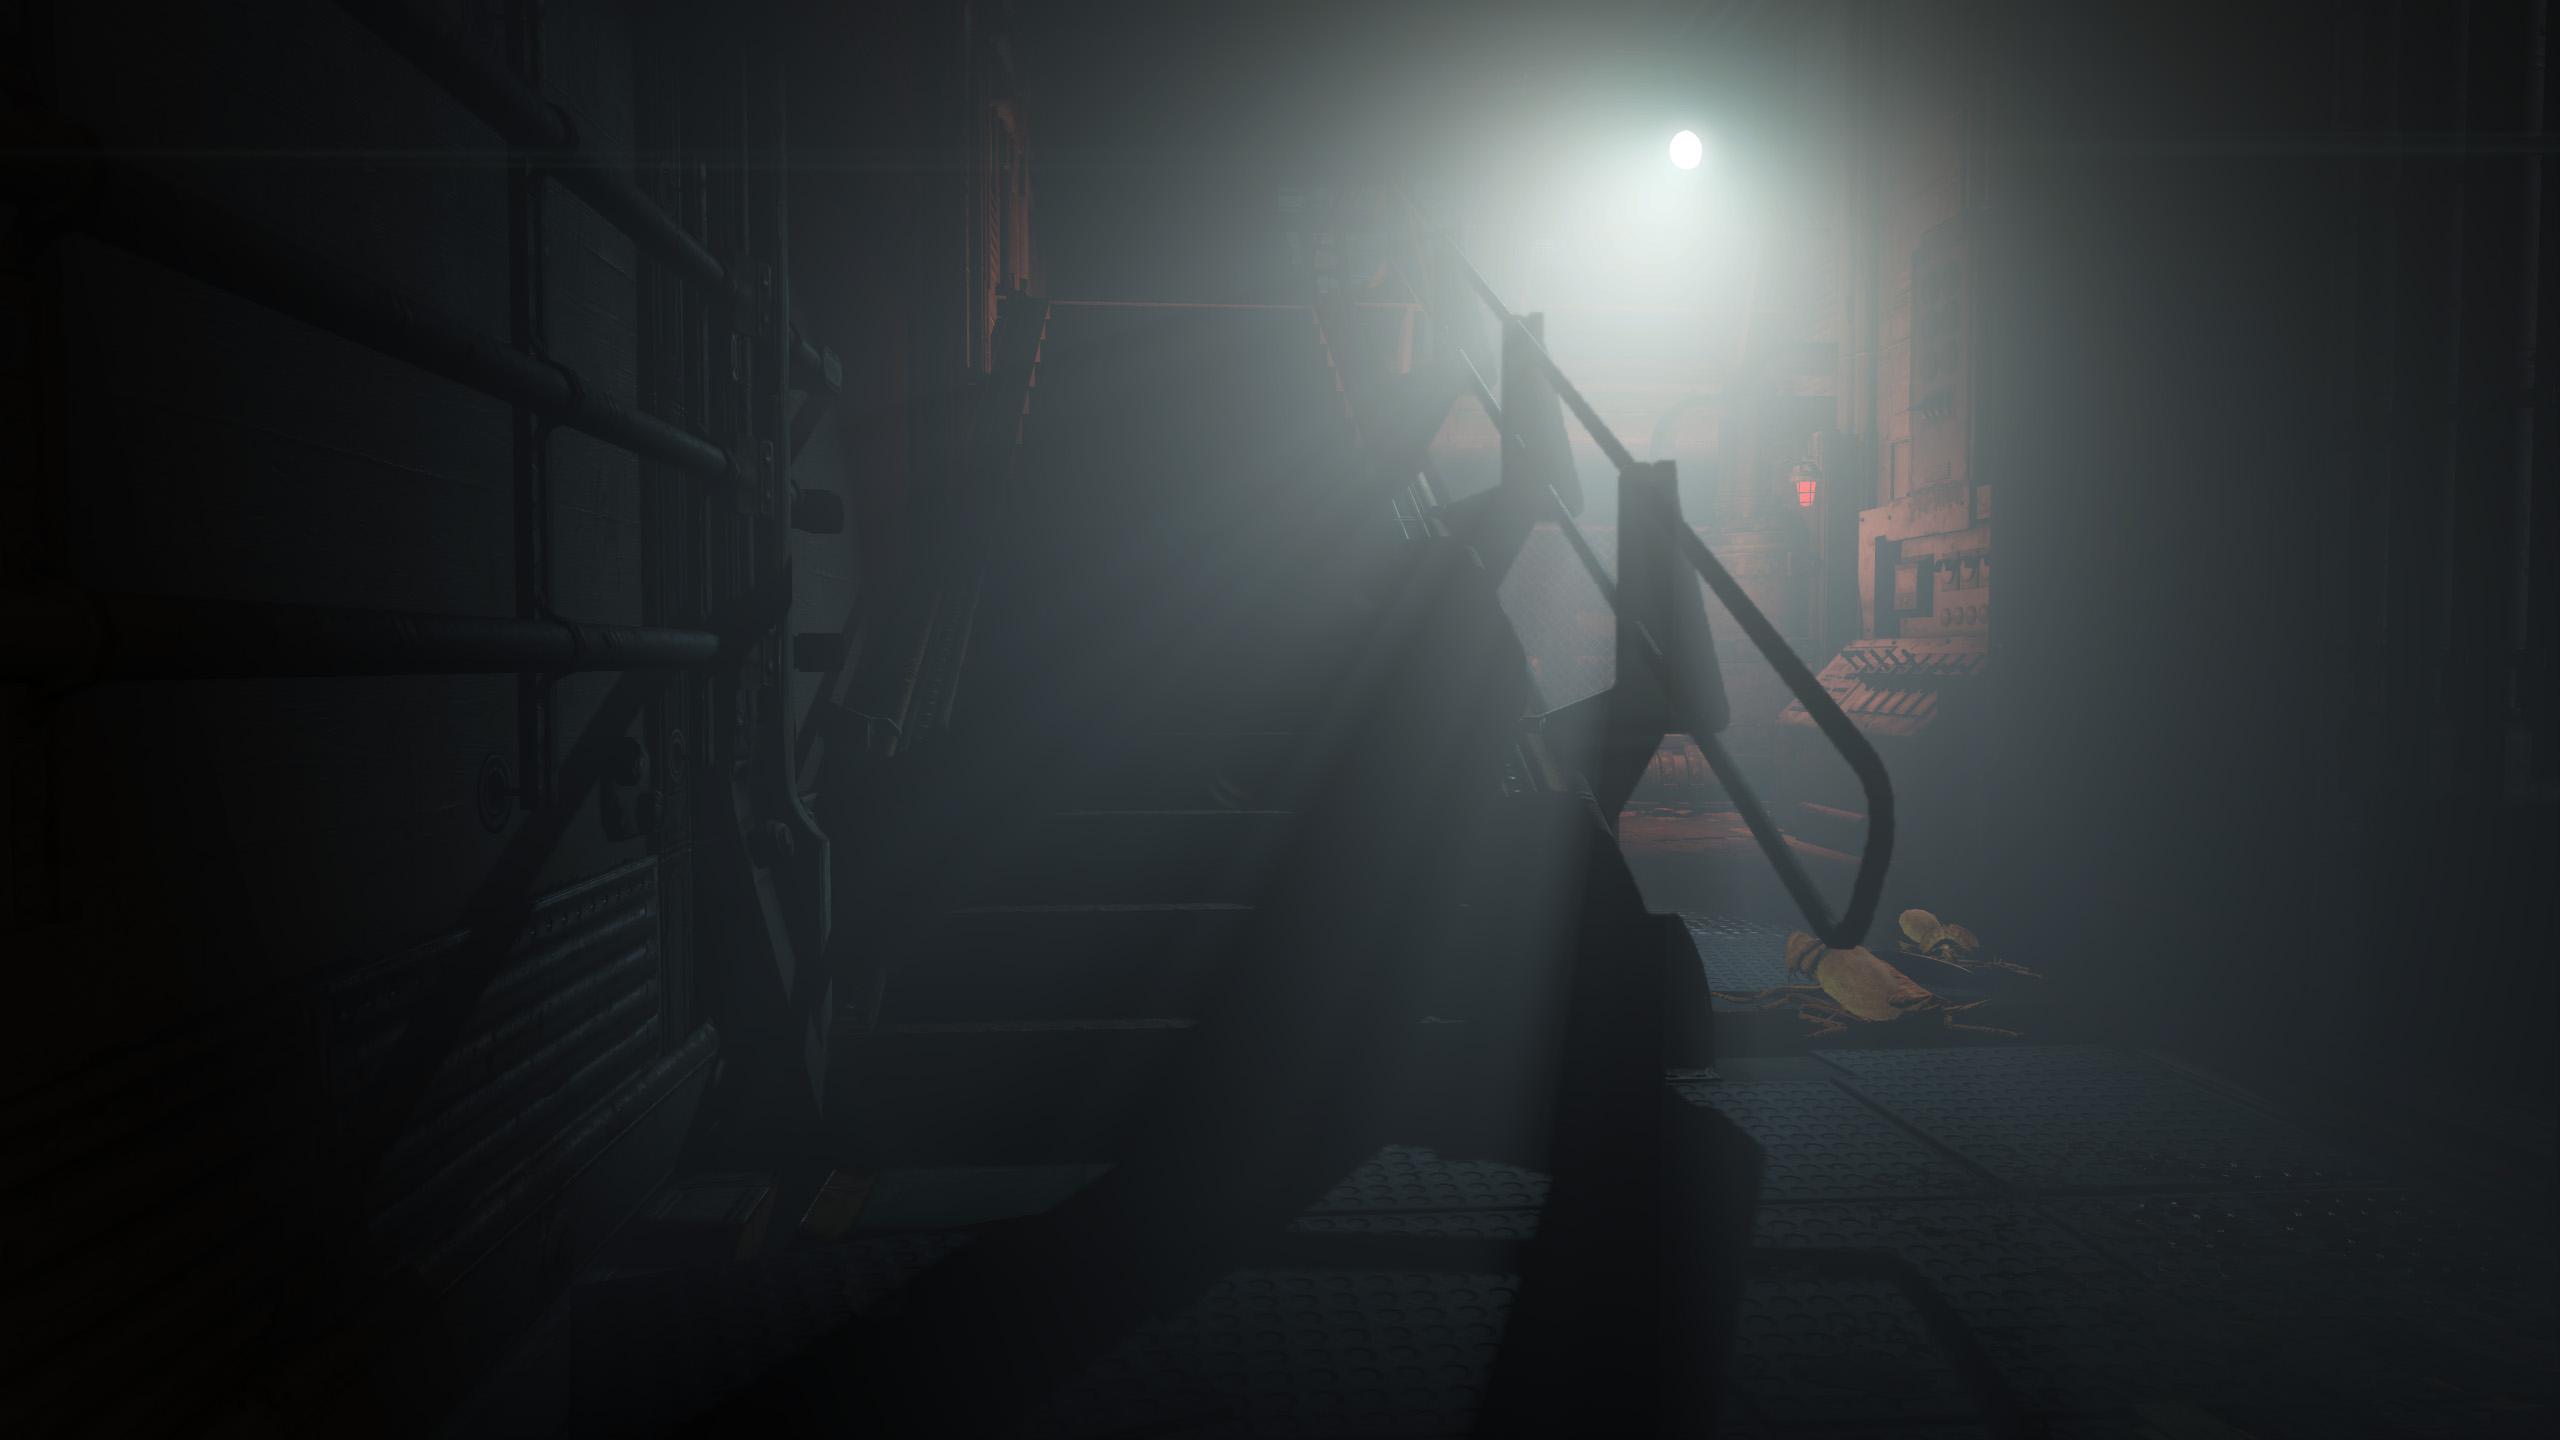 Vault 1080 для Fallout 4 - Скриншот 2